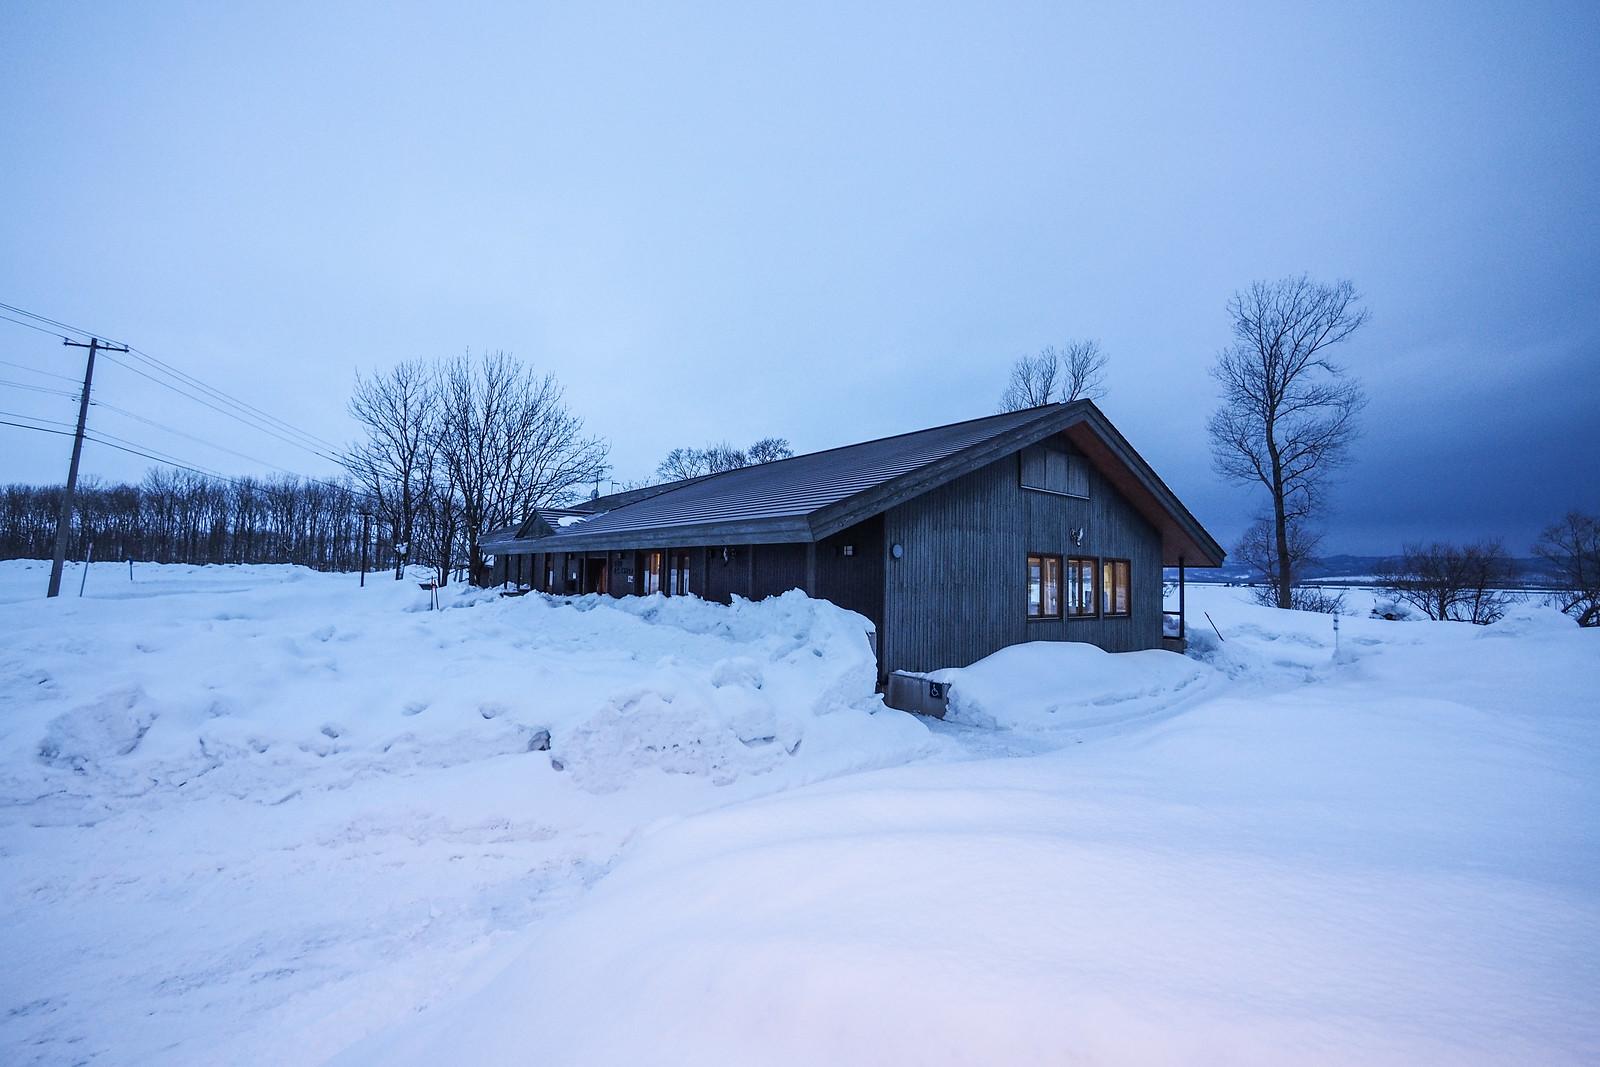 Mt. Goryo and Kami-Sunagawa Ski Field Ski Touring (Hokkaido, Japan)